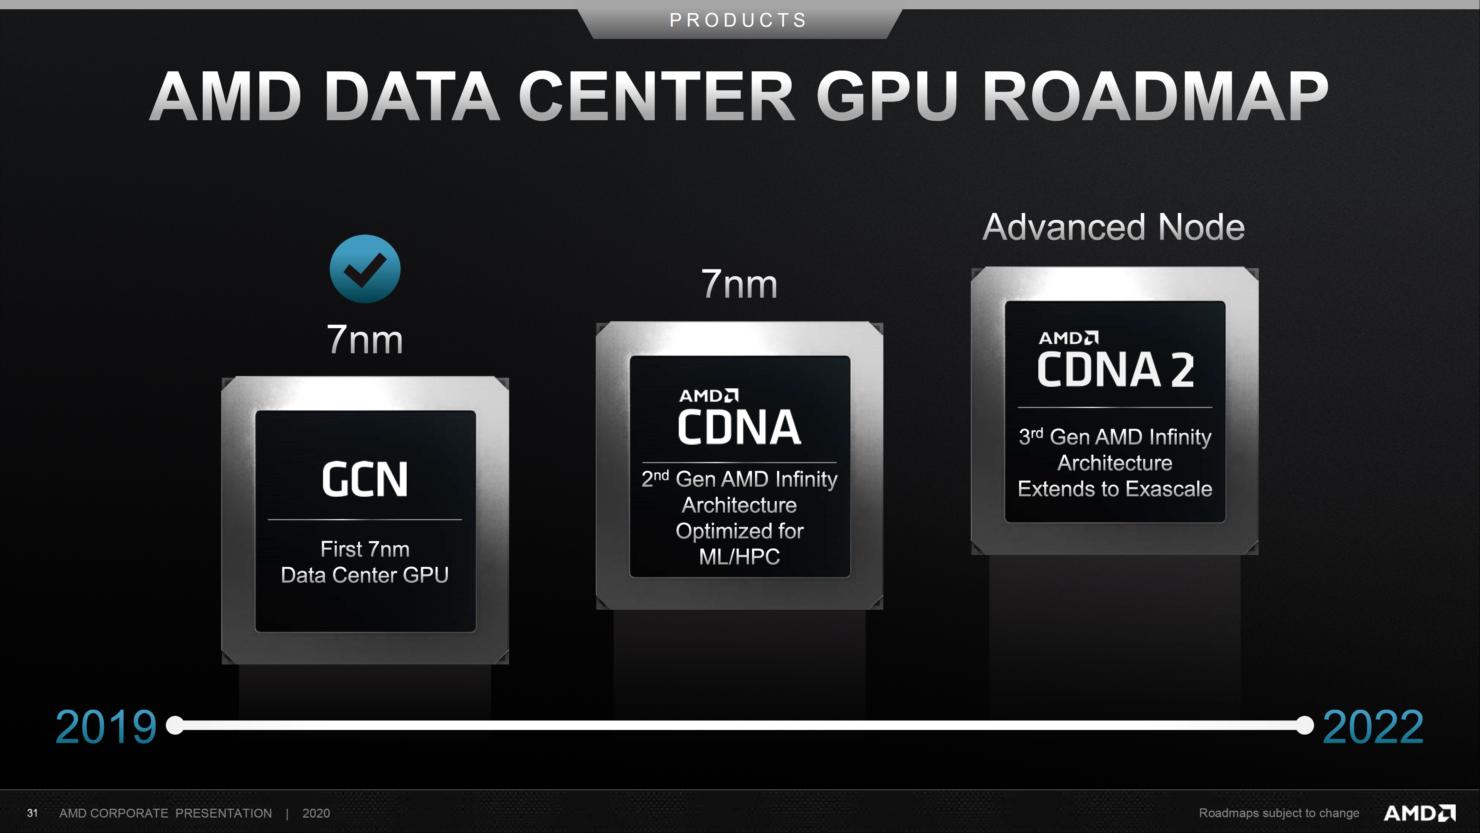 amd-data-center-gpu-roadmap-2019-2022